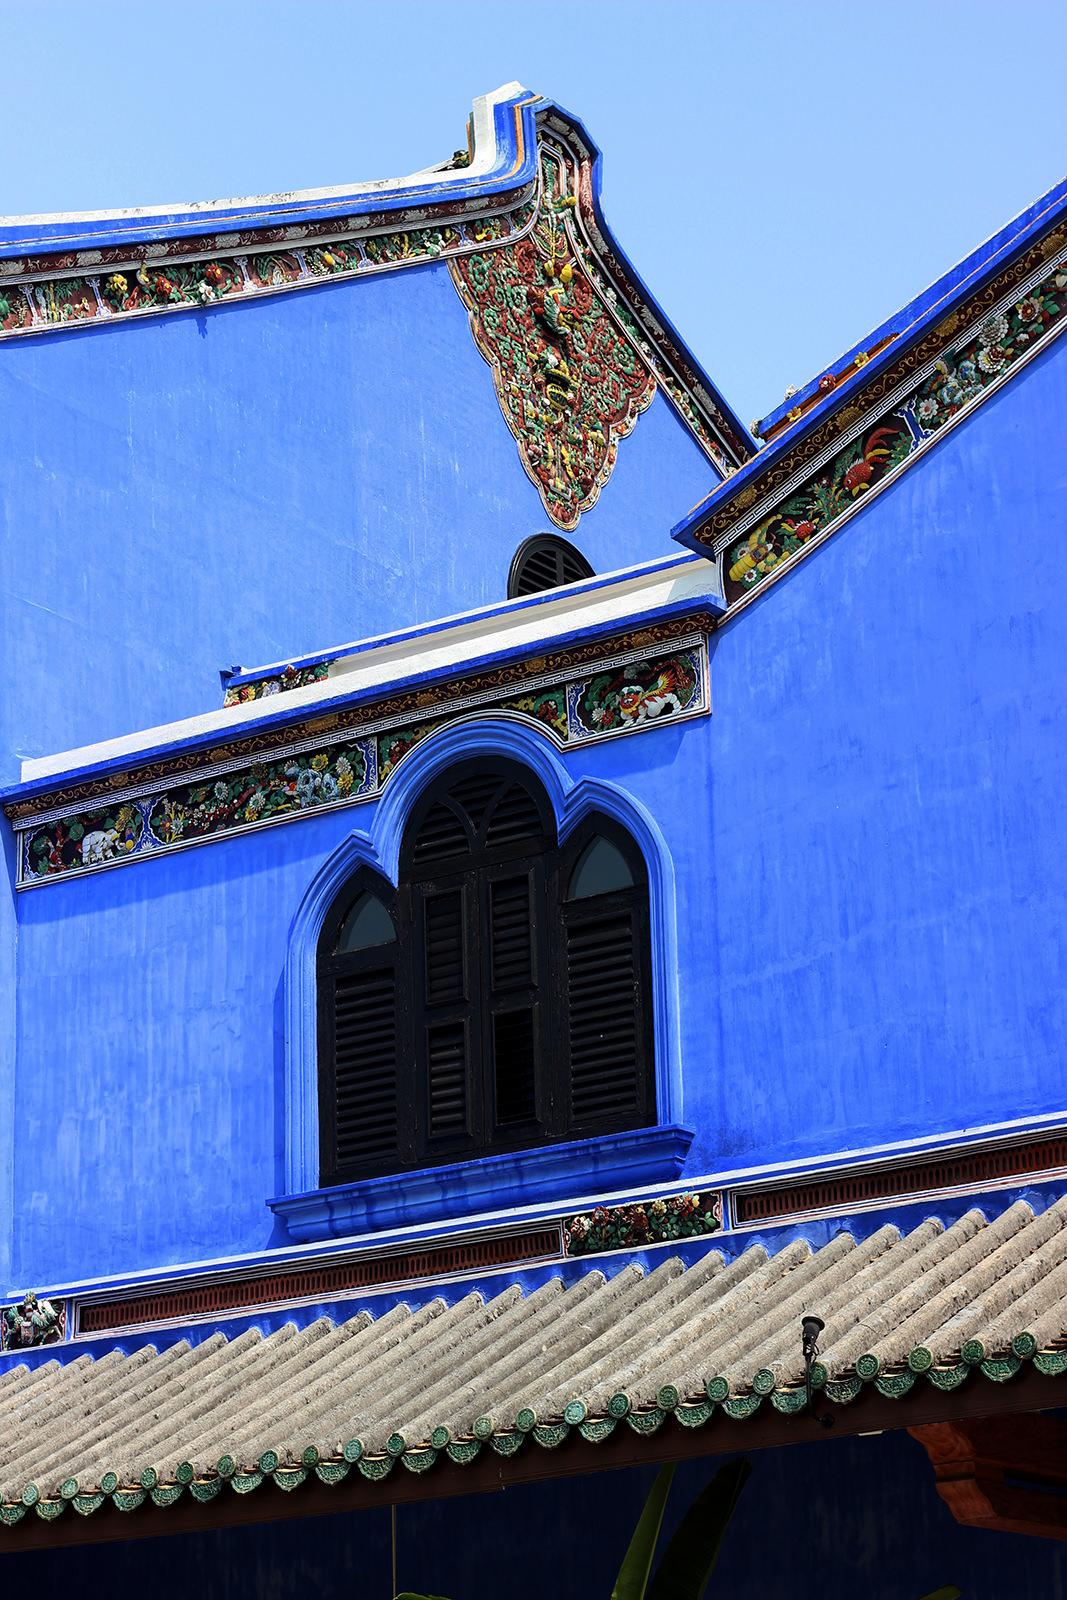 boutique-hotel-penang-island-blue-mansion-architecture-11 Architecture